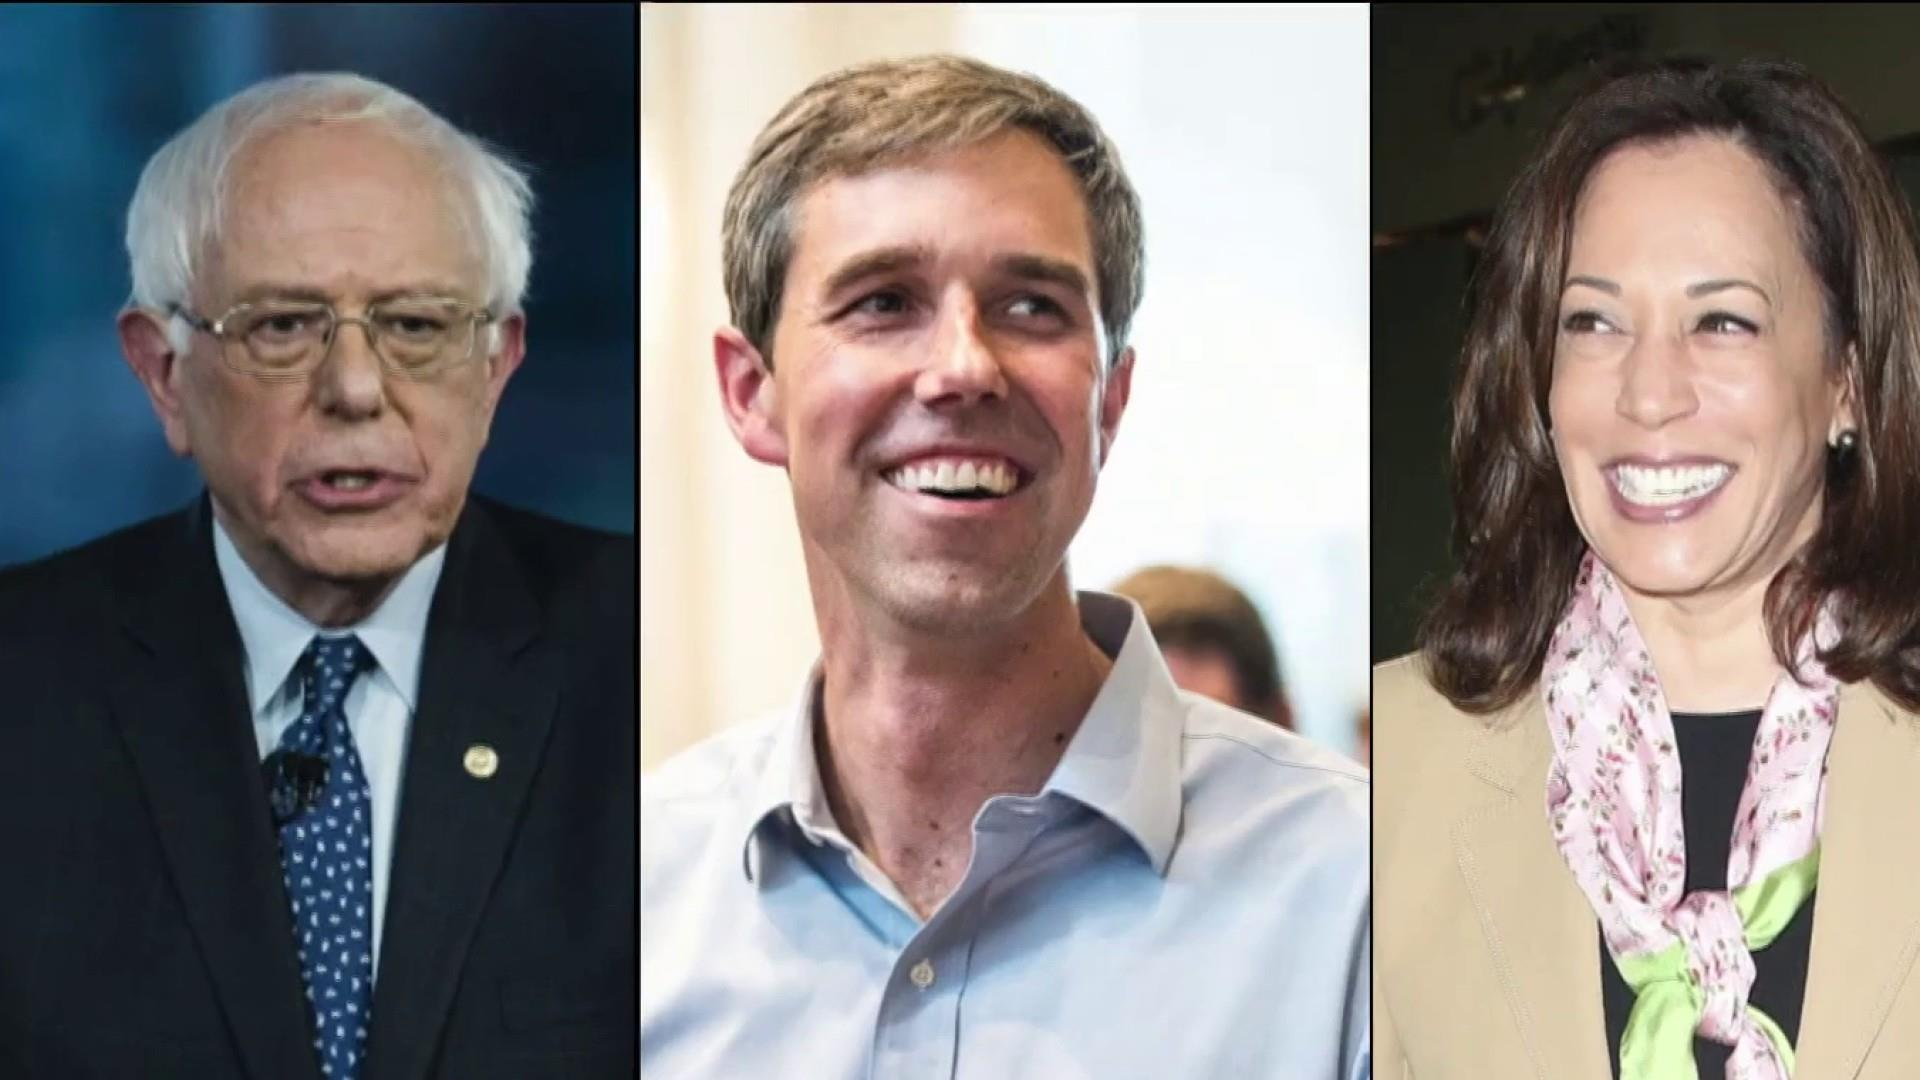 Democratic candidates visit Florida migrant facility ahead of 2020 debate